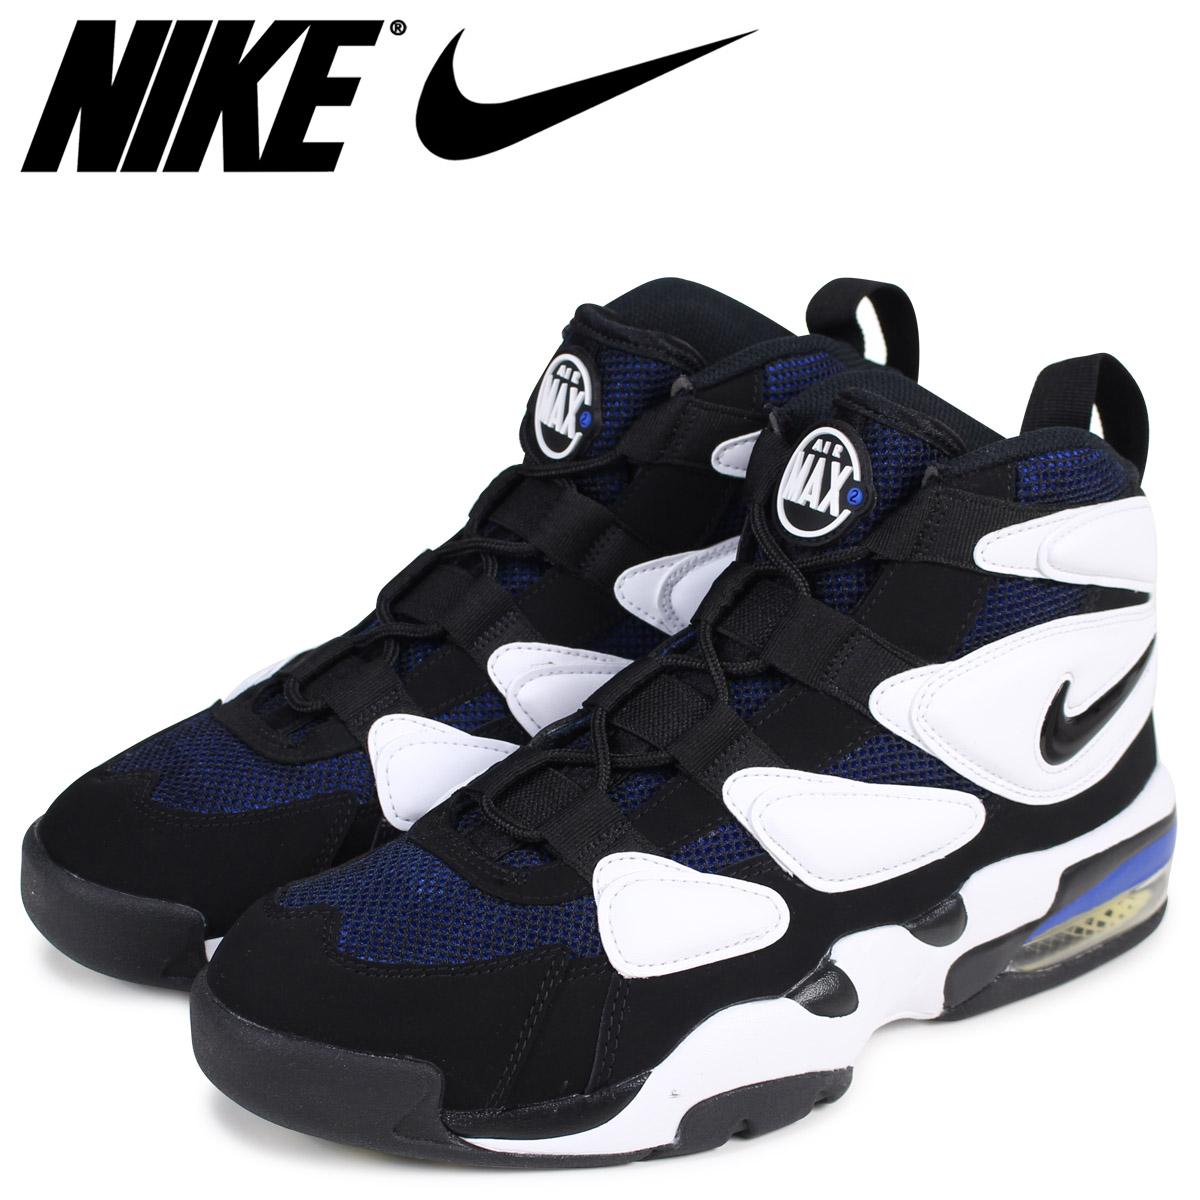 78b1086774e Sugar Online Shop  NIKE Kie Ney AMAX 2 up tempo sneakers AIR MAX 2 ...